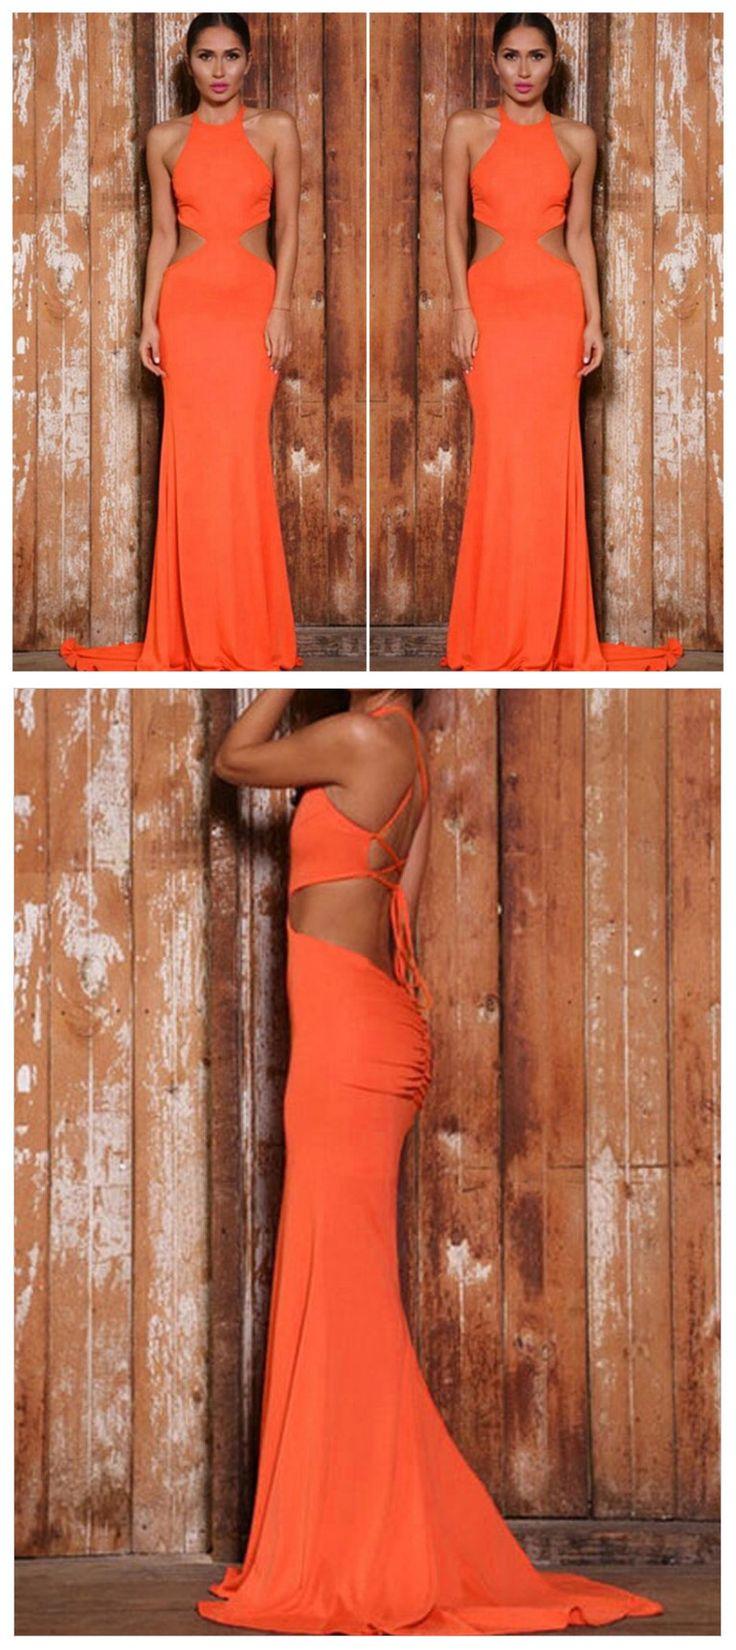 Elegant Sexy Prom Dresses,Orange Prom Dresses,Sleeveless Prom Dresses,Halter